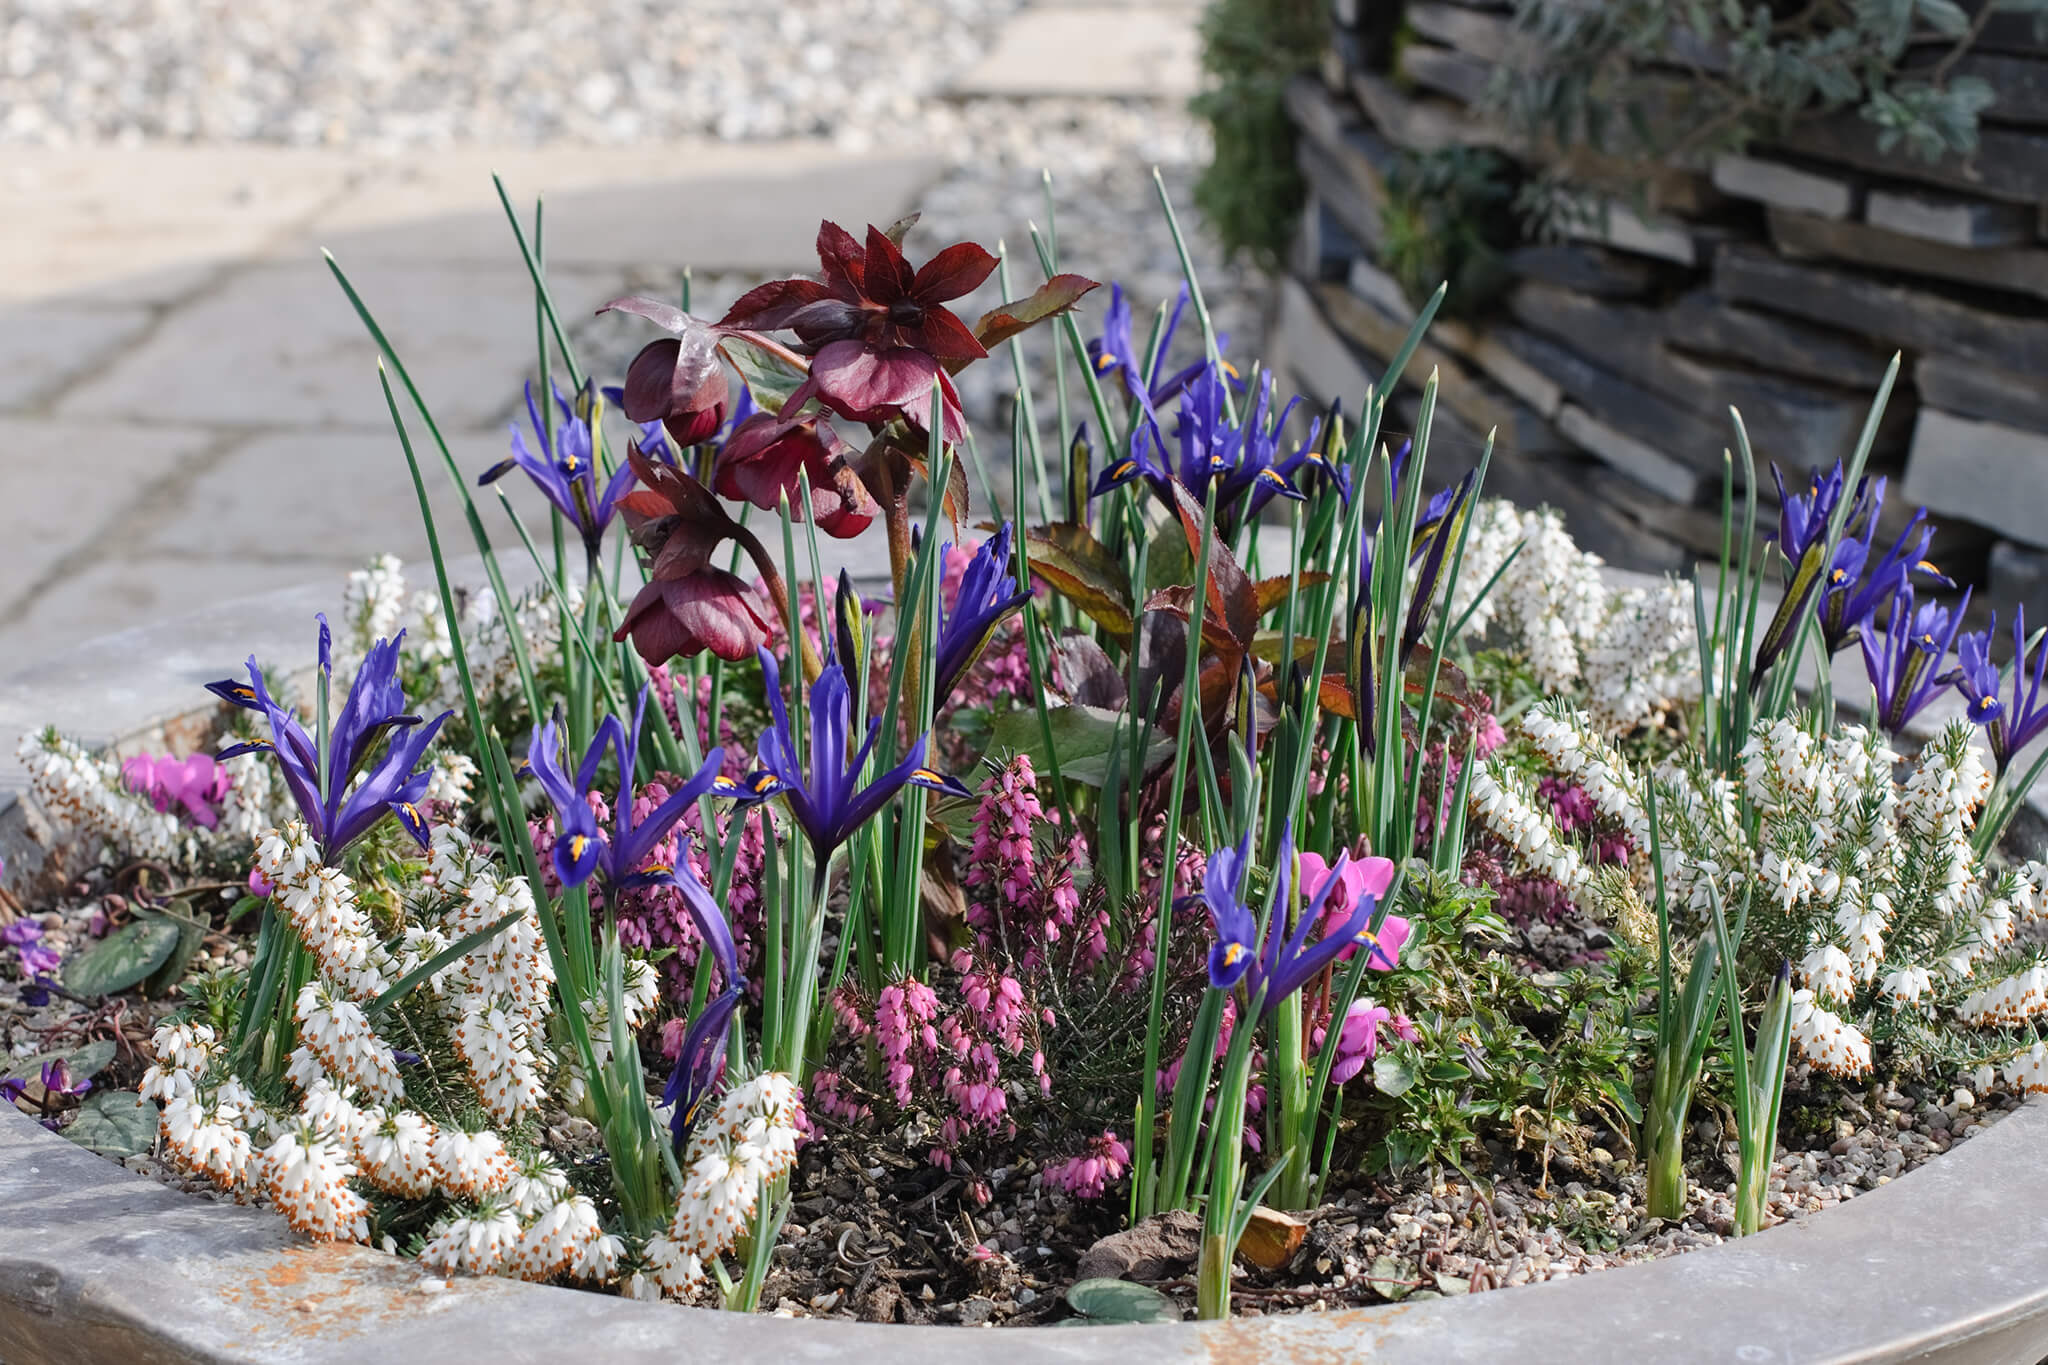 winter-heather-and-reticulate-irises-2